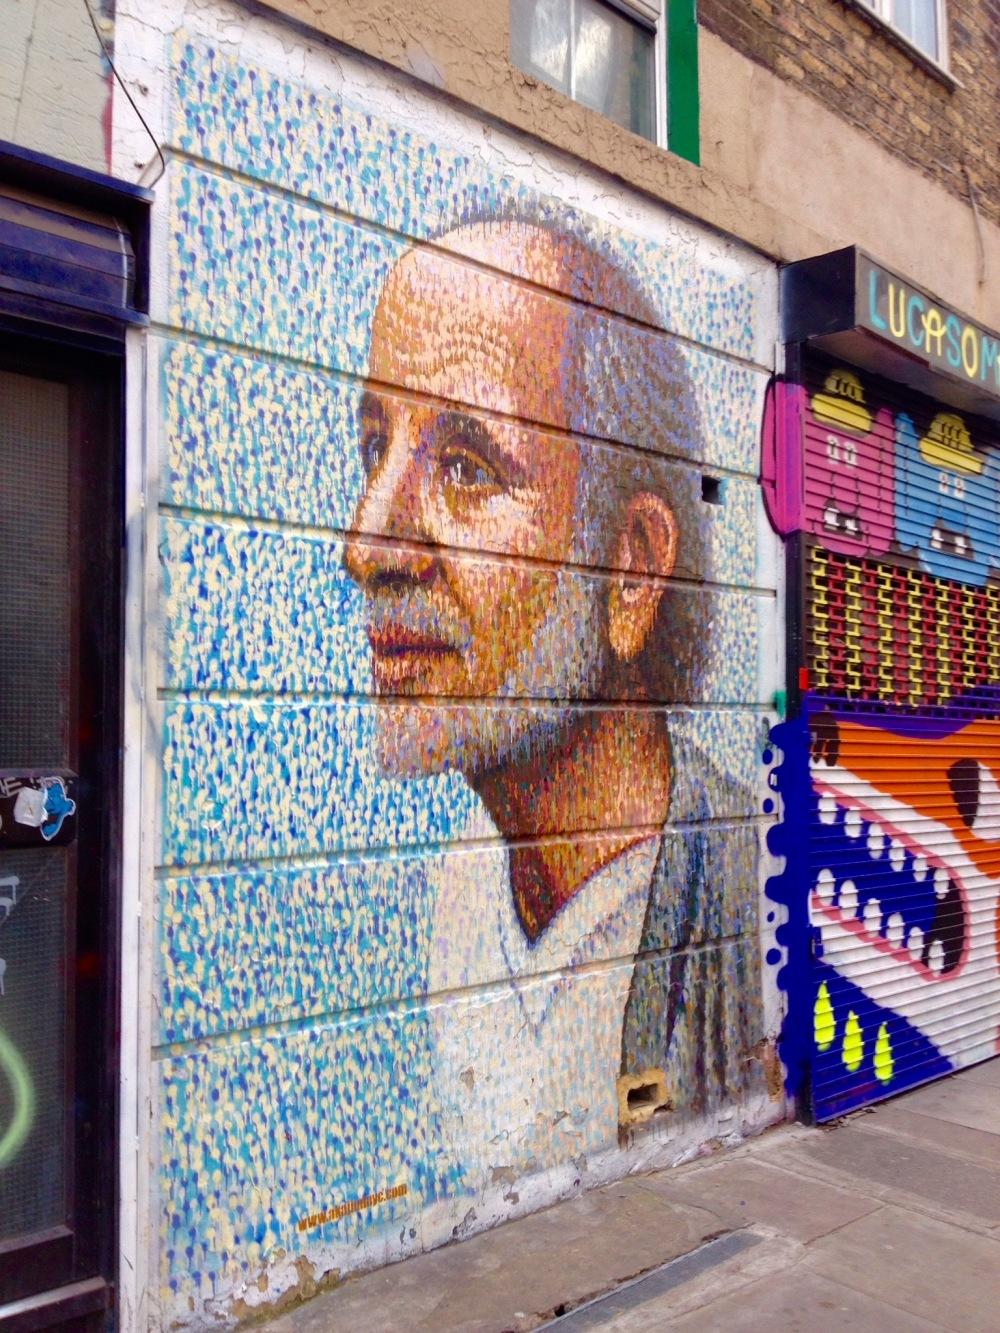 Street-art-brick-lane-shoreditch-london